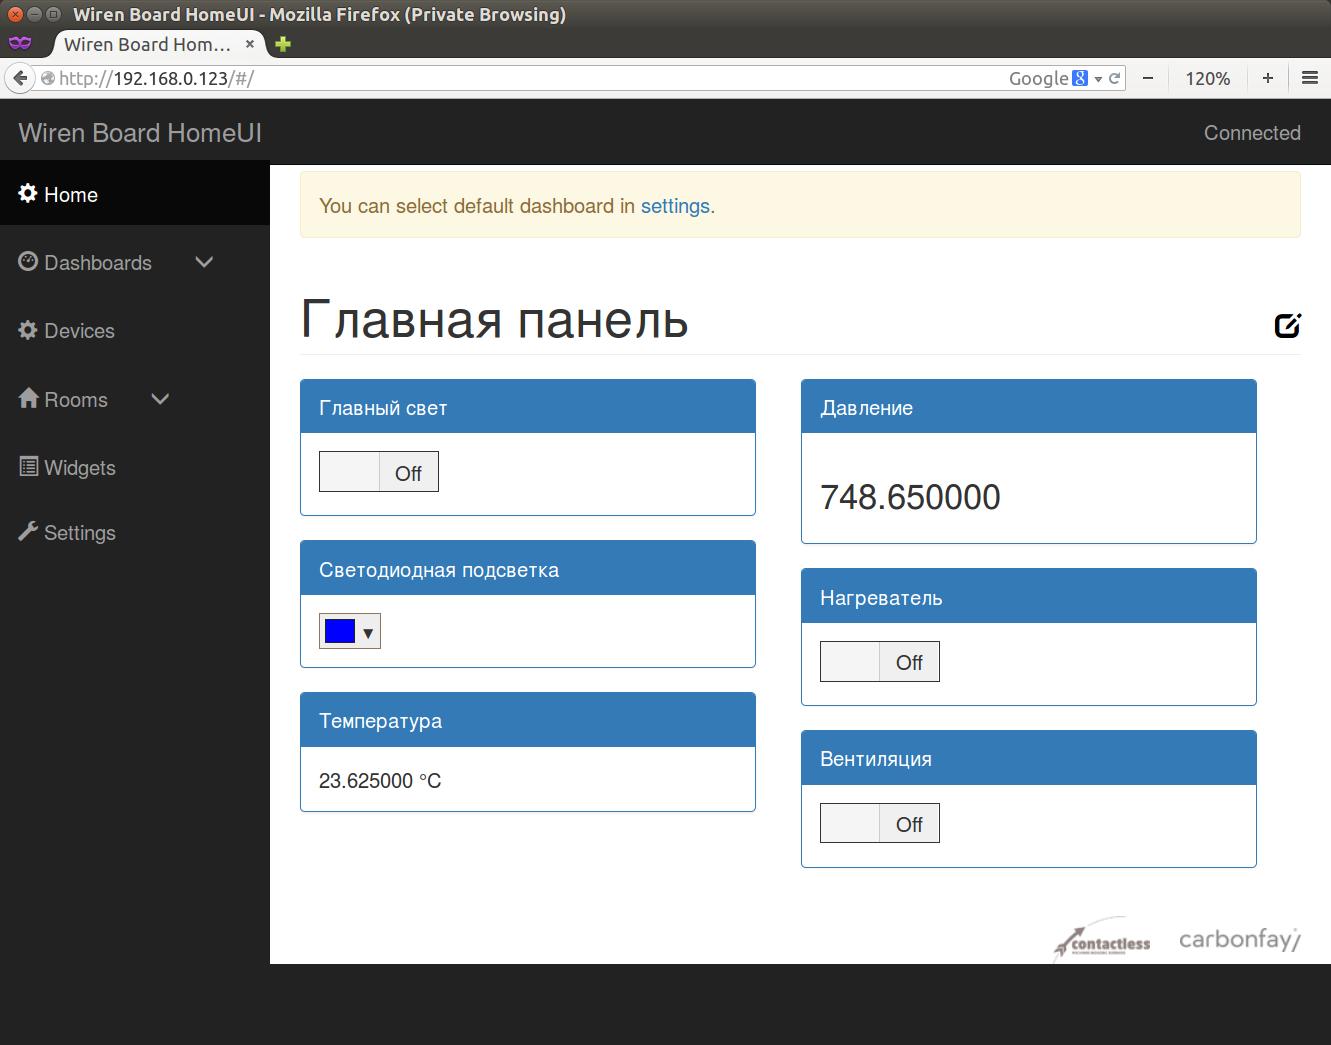 веб-інтерфейс